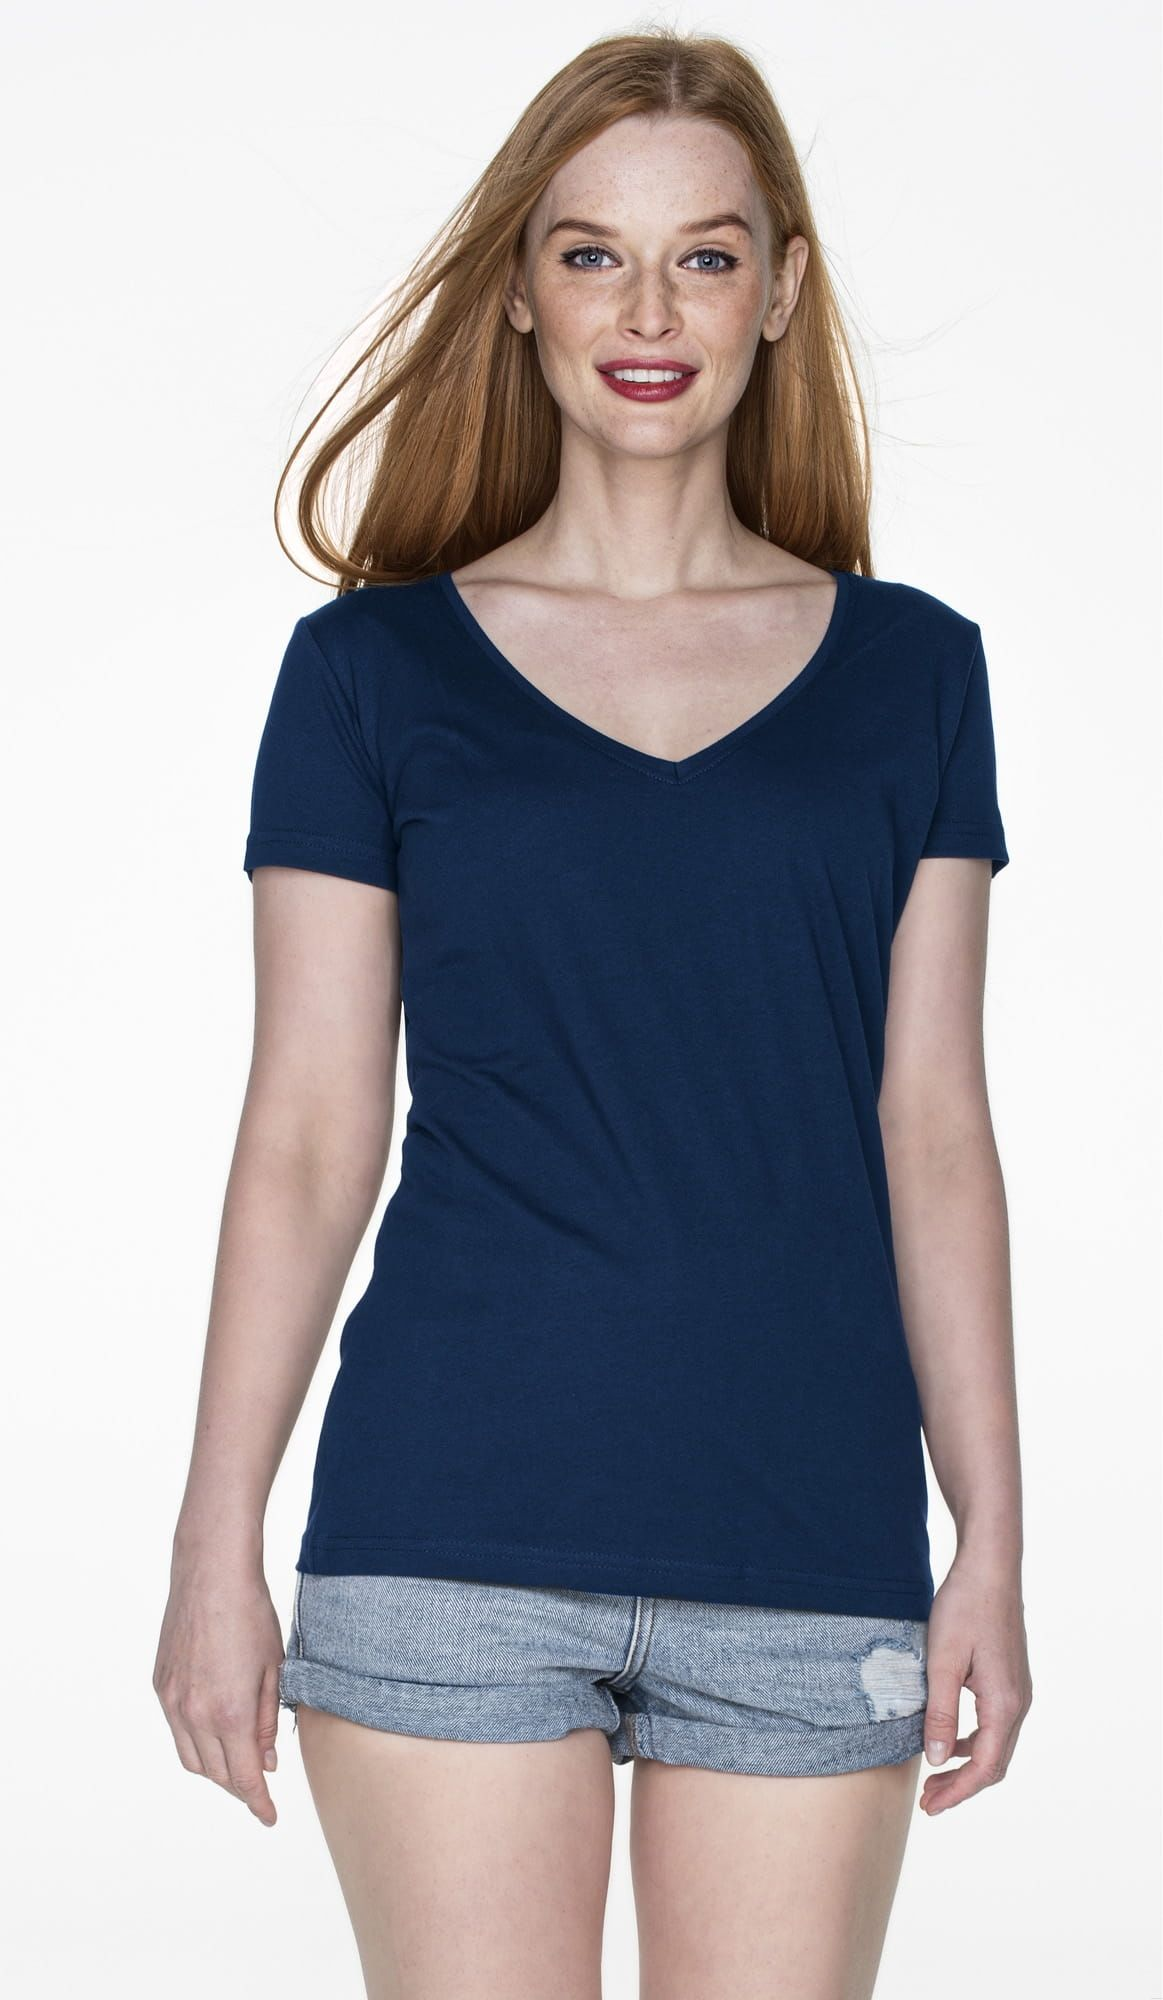 T-shirt ladies v-neck